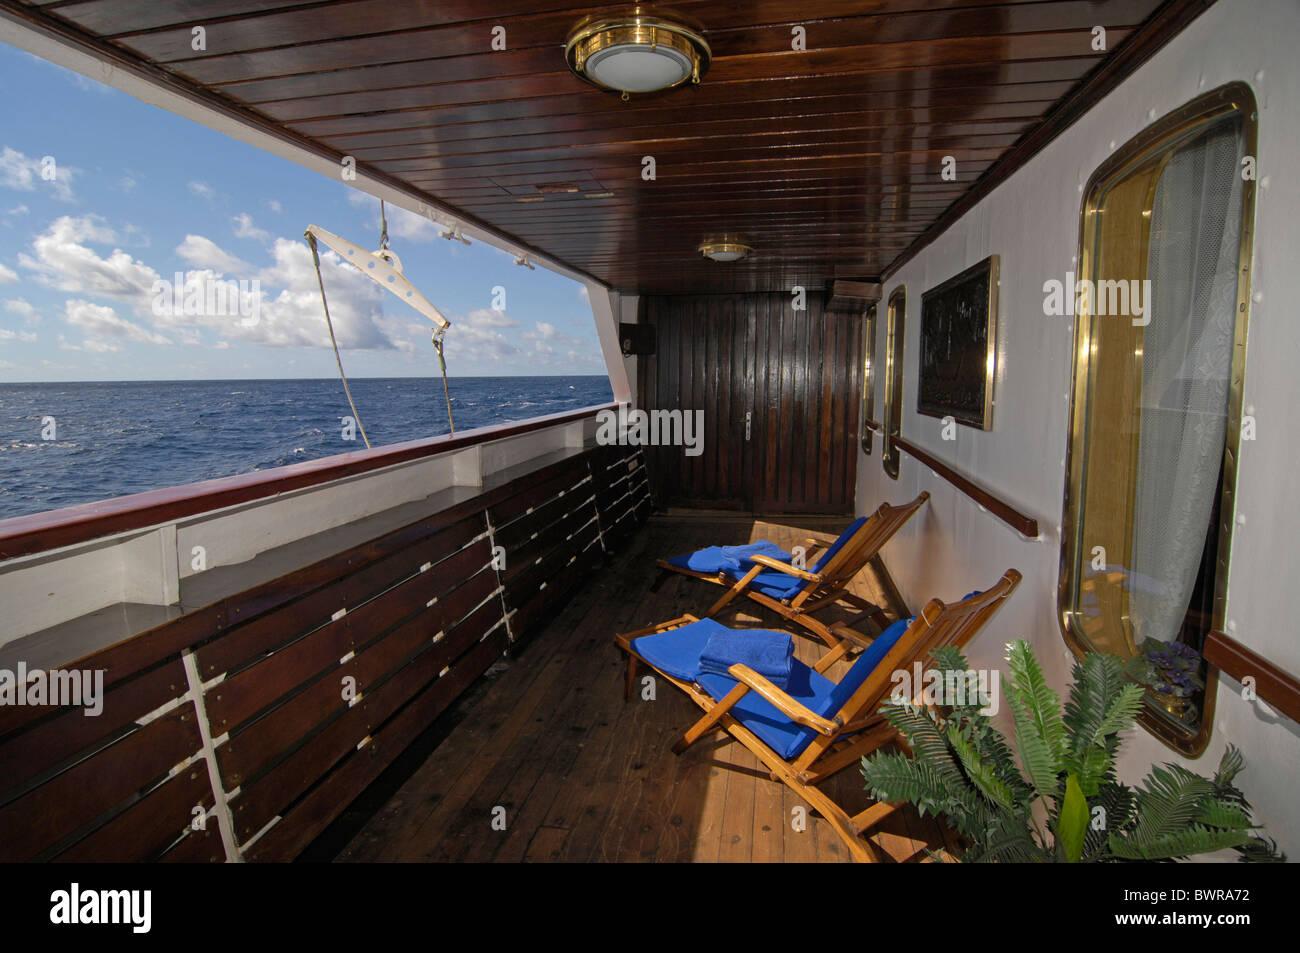 MS Royal Star Cruise ship Indian Ocean cruiser cruise liner water sea travel traveling vacation holidays ho Stock Photo